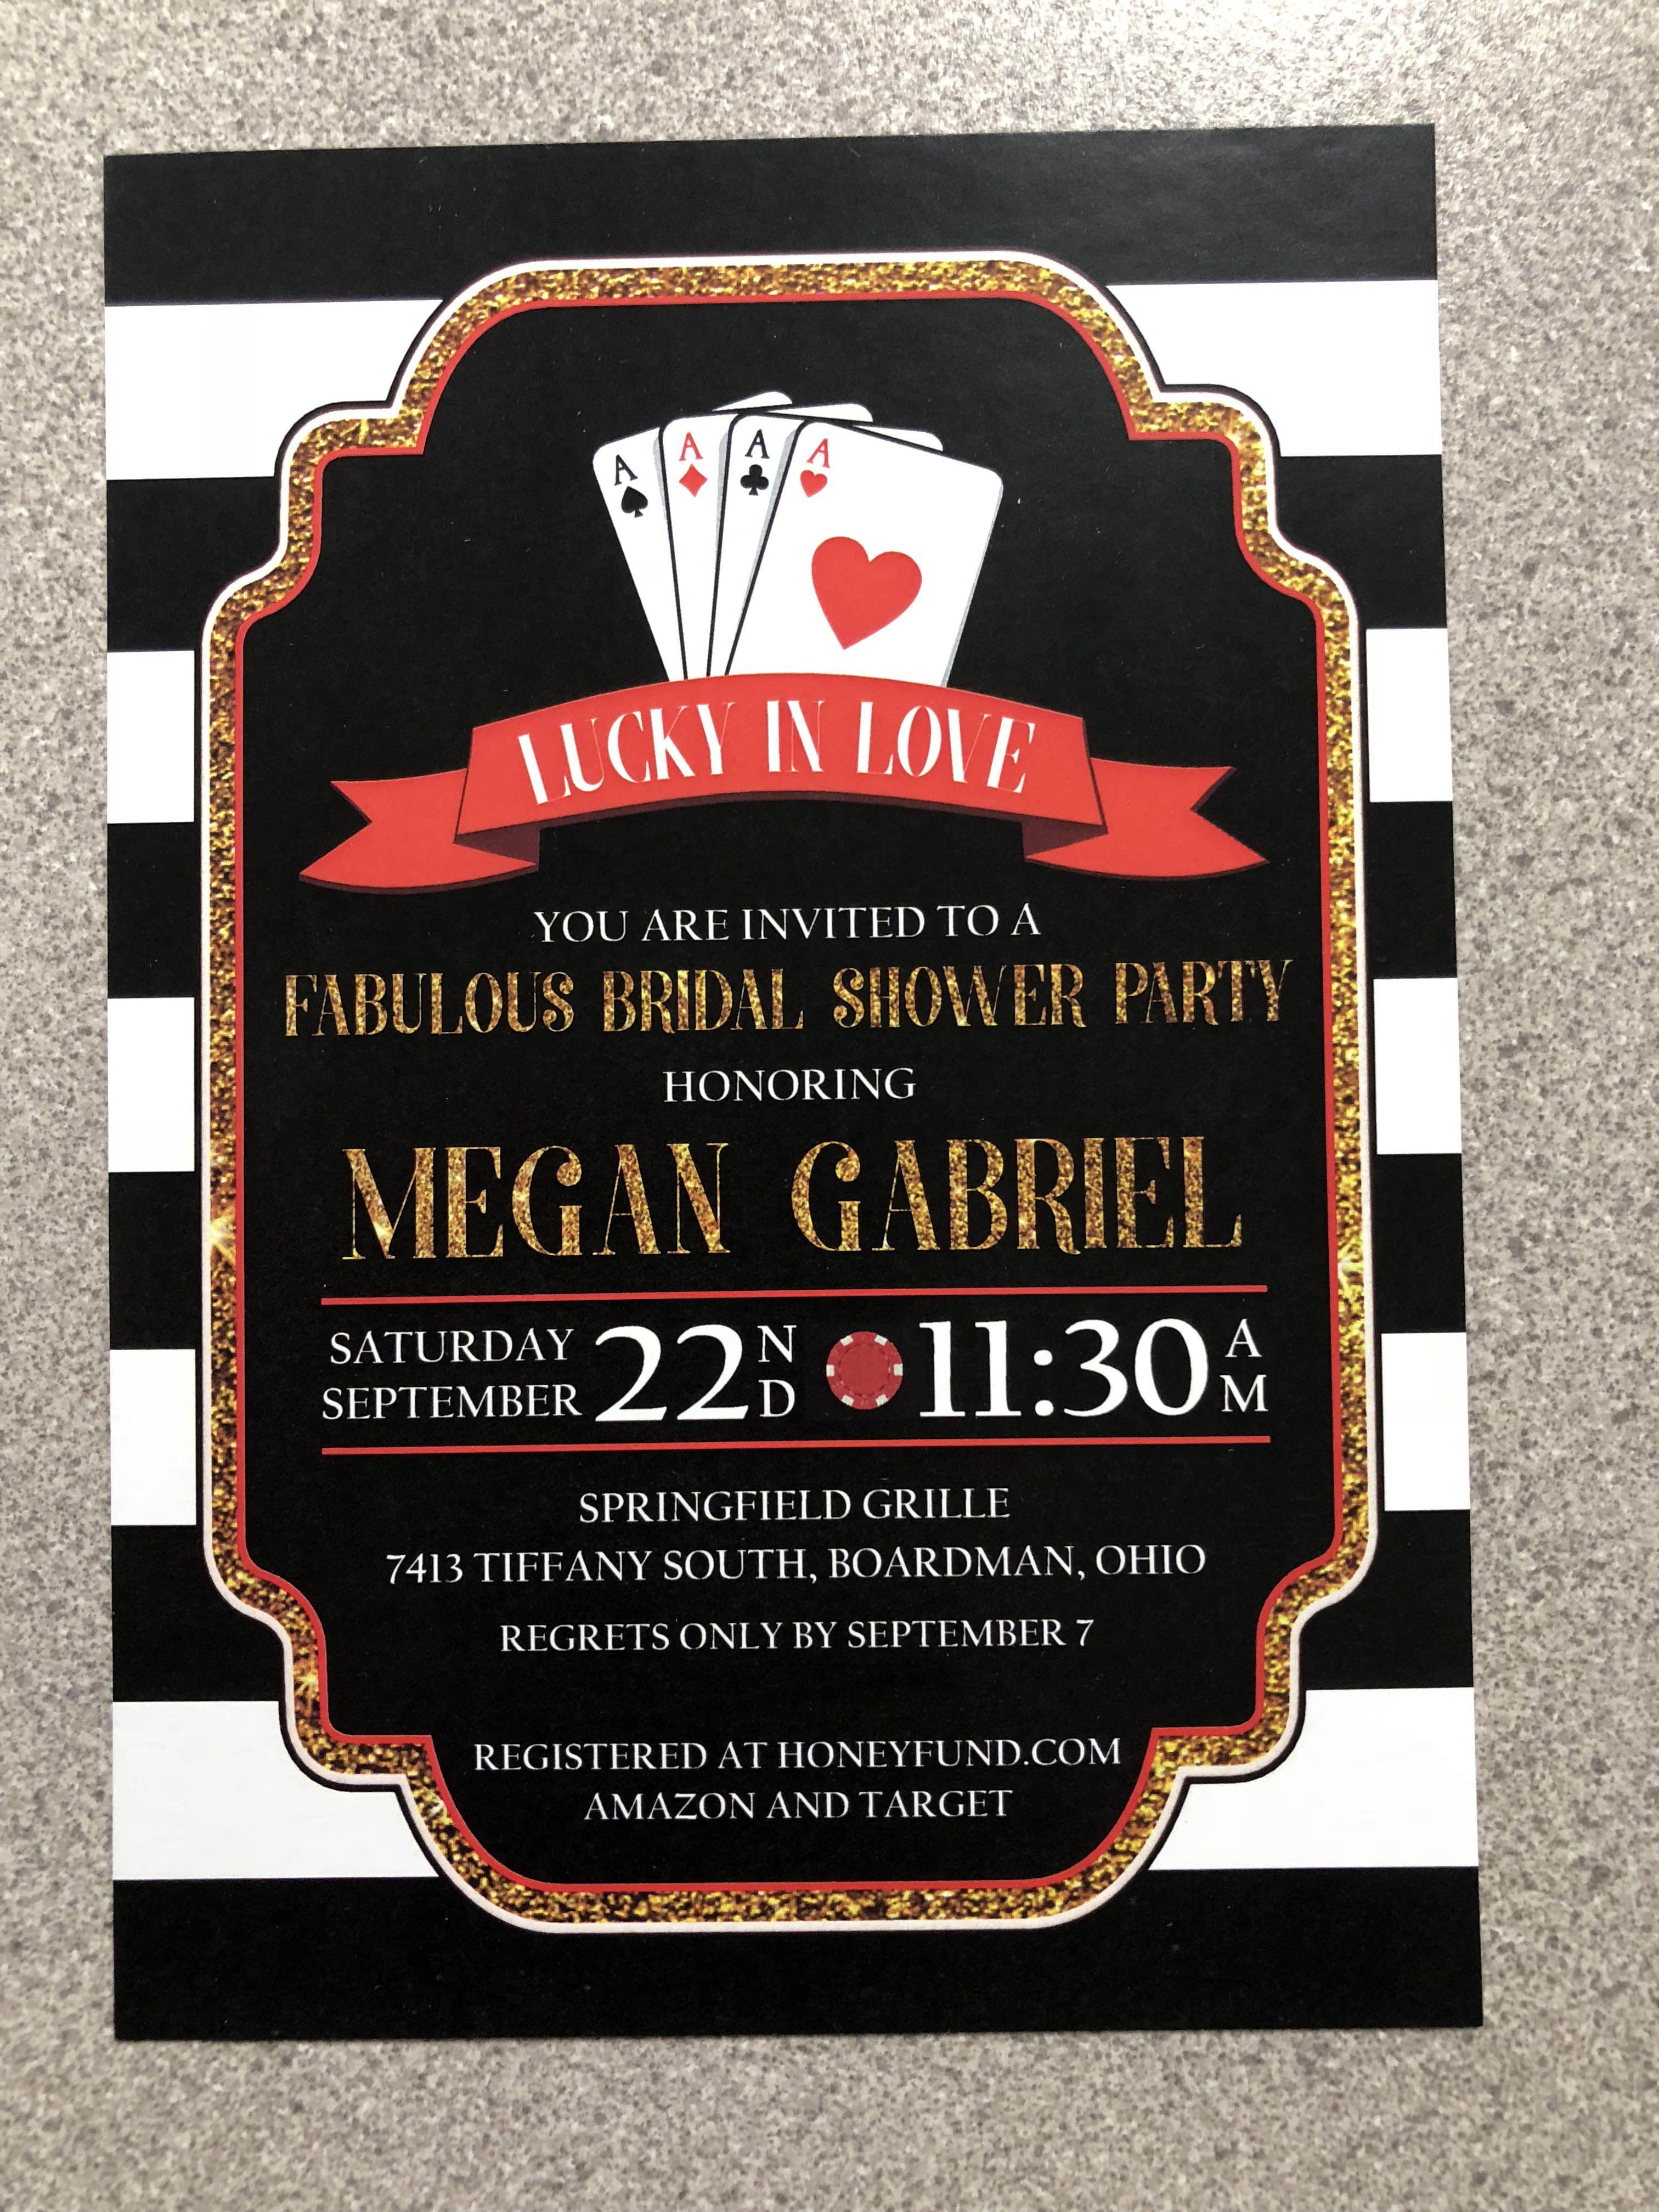 custom bridal shower invitation from boardman printing bridal shower invitations bridal showers bachelorette